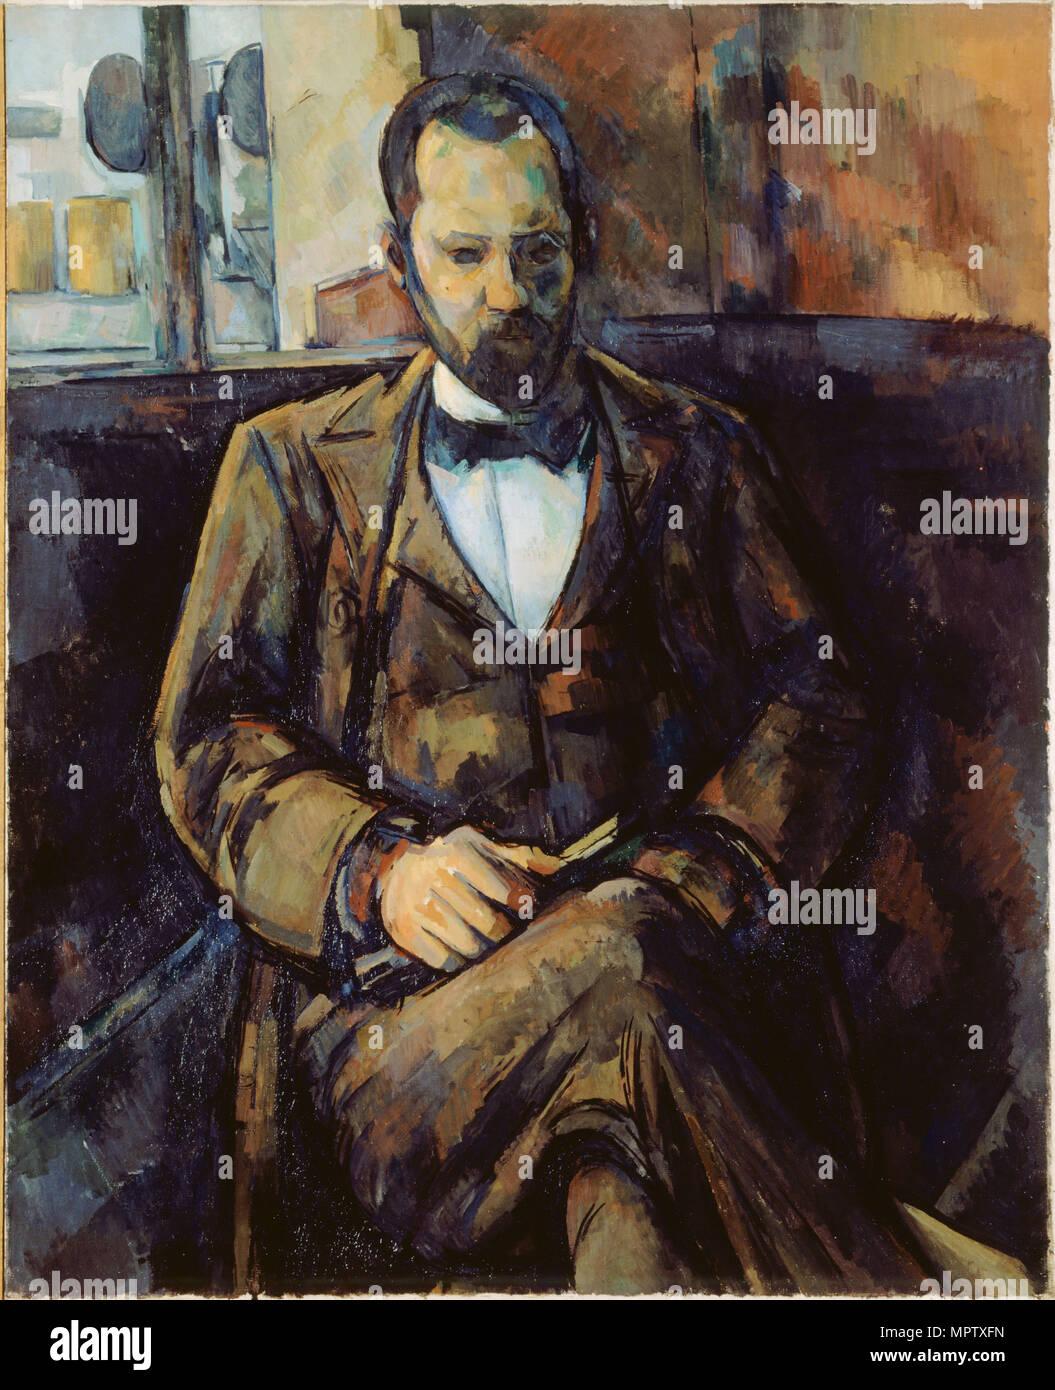 Portrait of Ambroise Vollard. - Stock Image